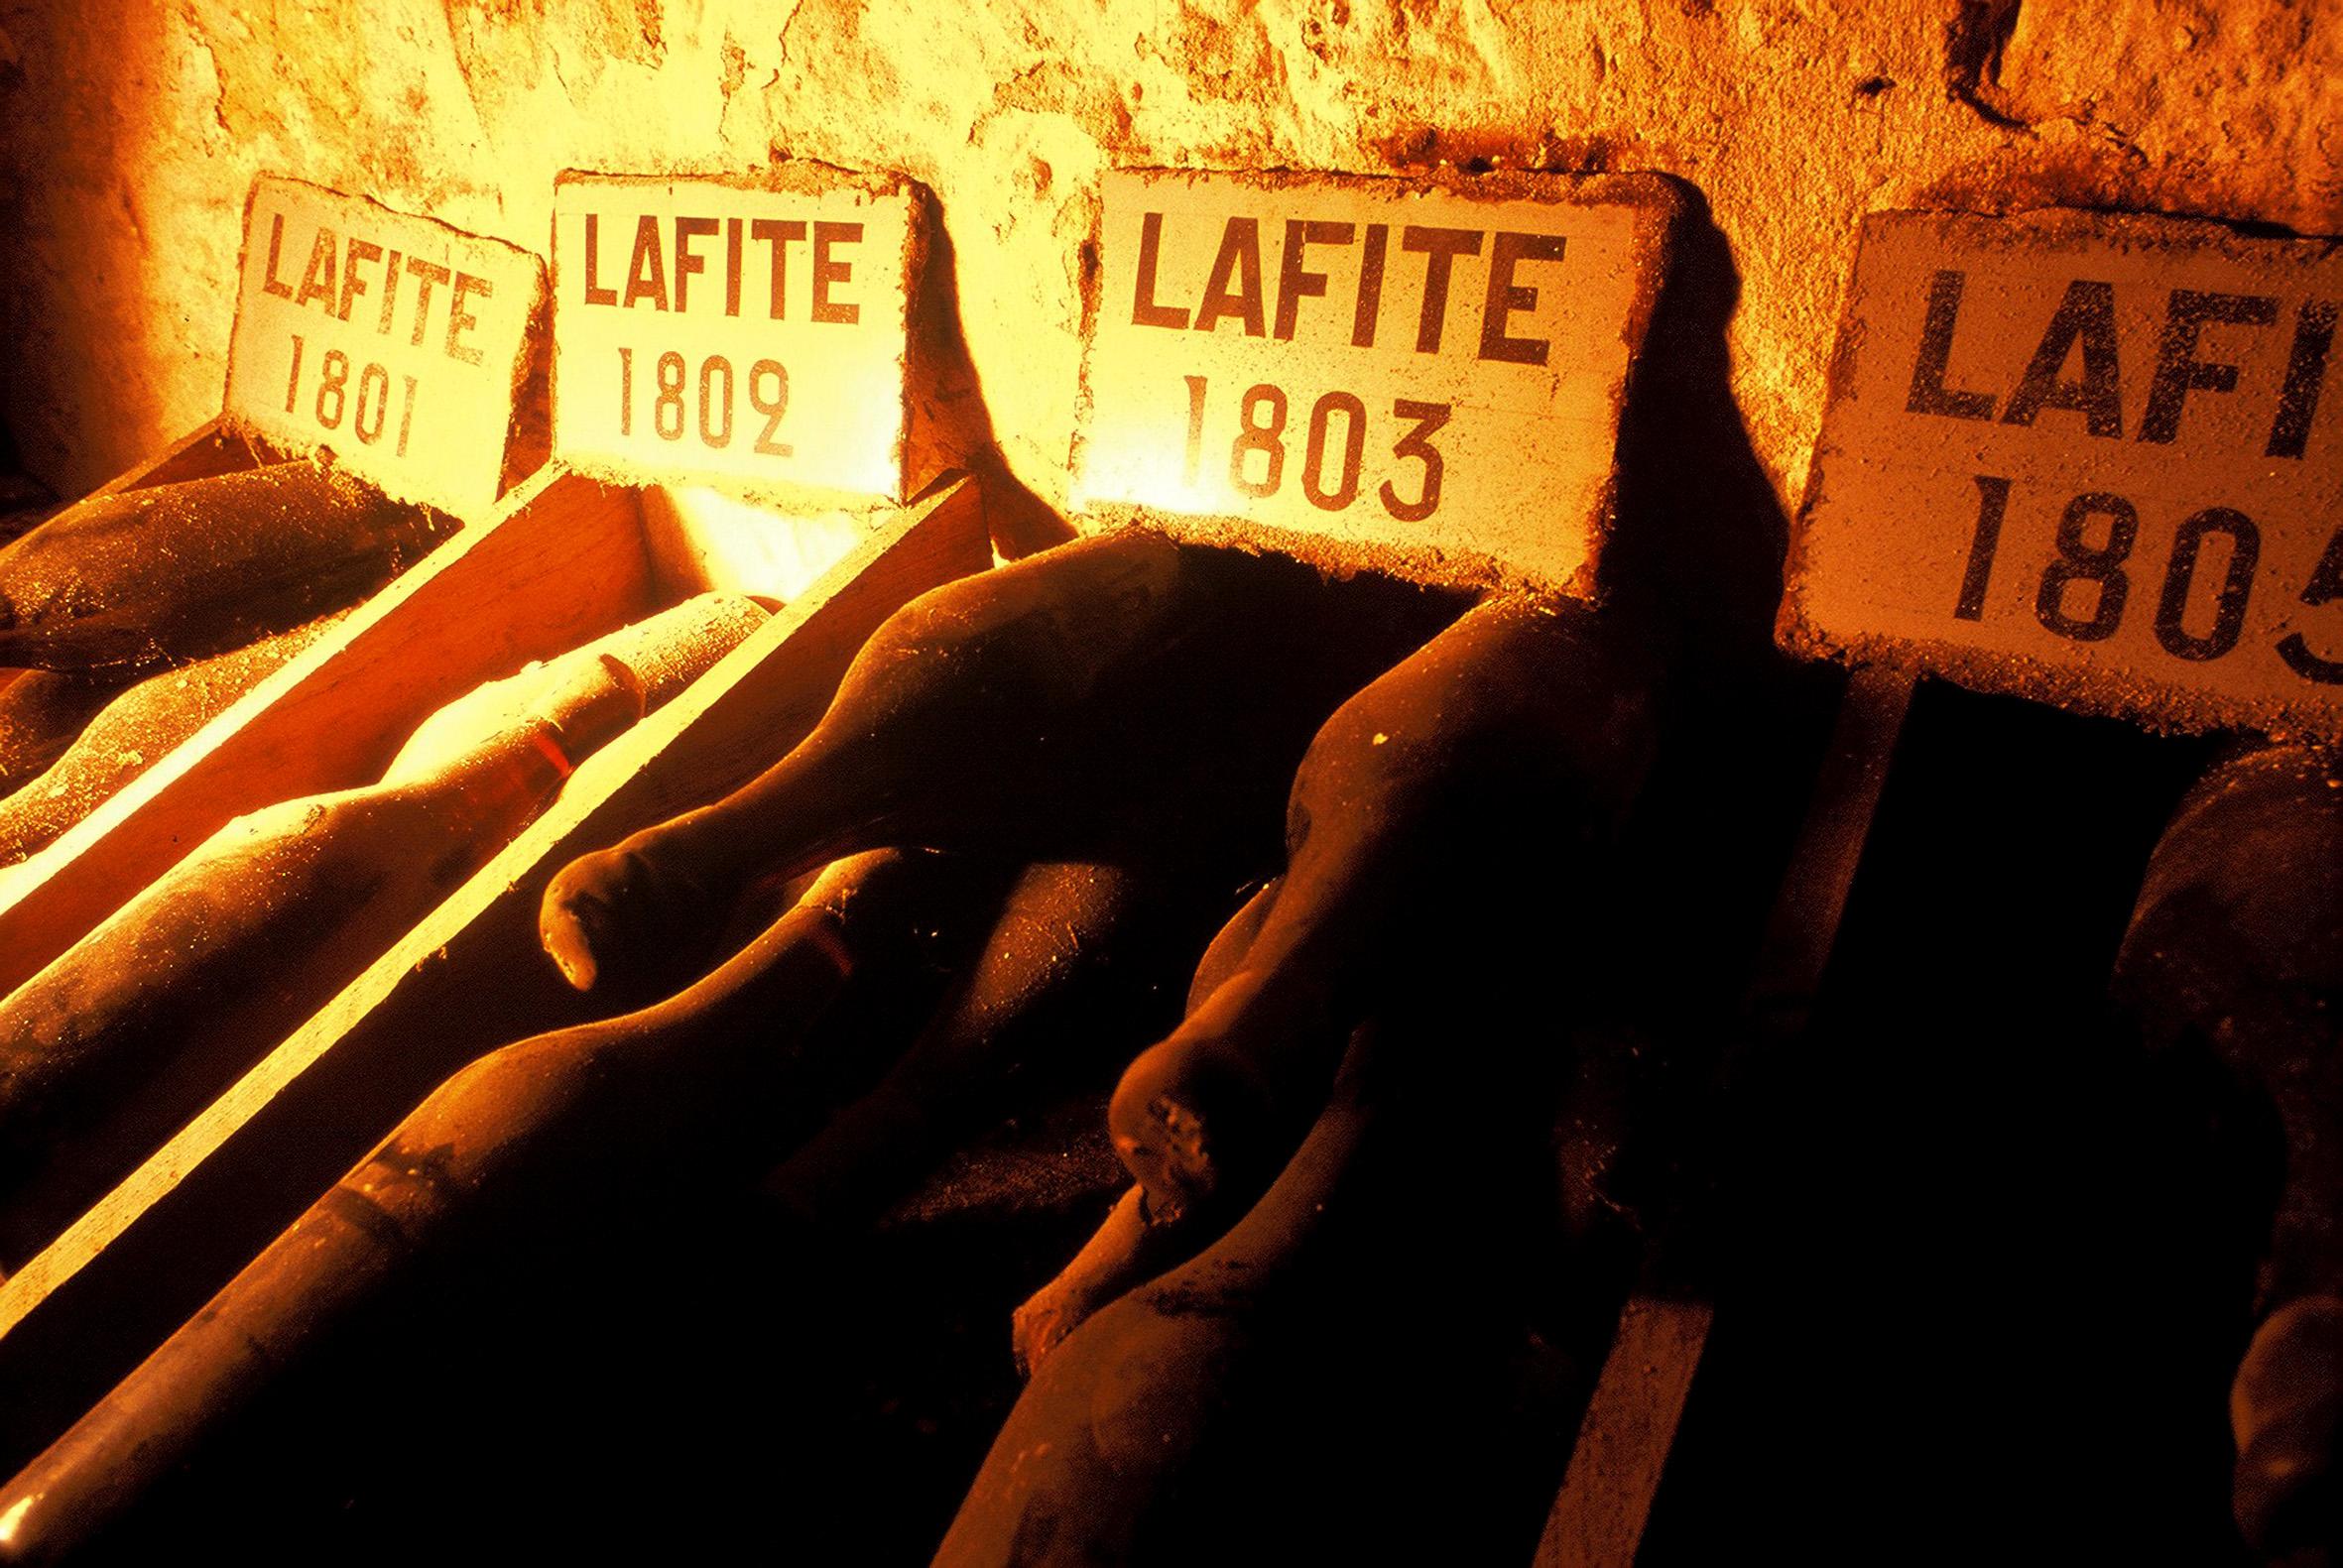 Lafite-various-old-bottles.jpg